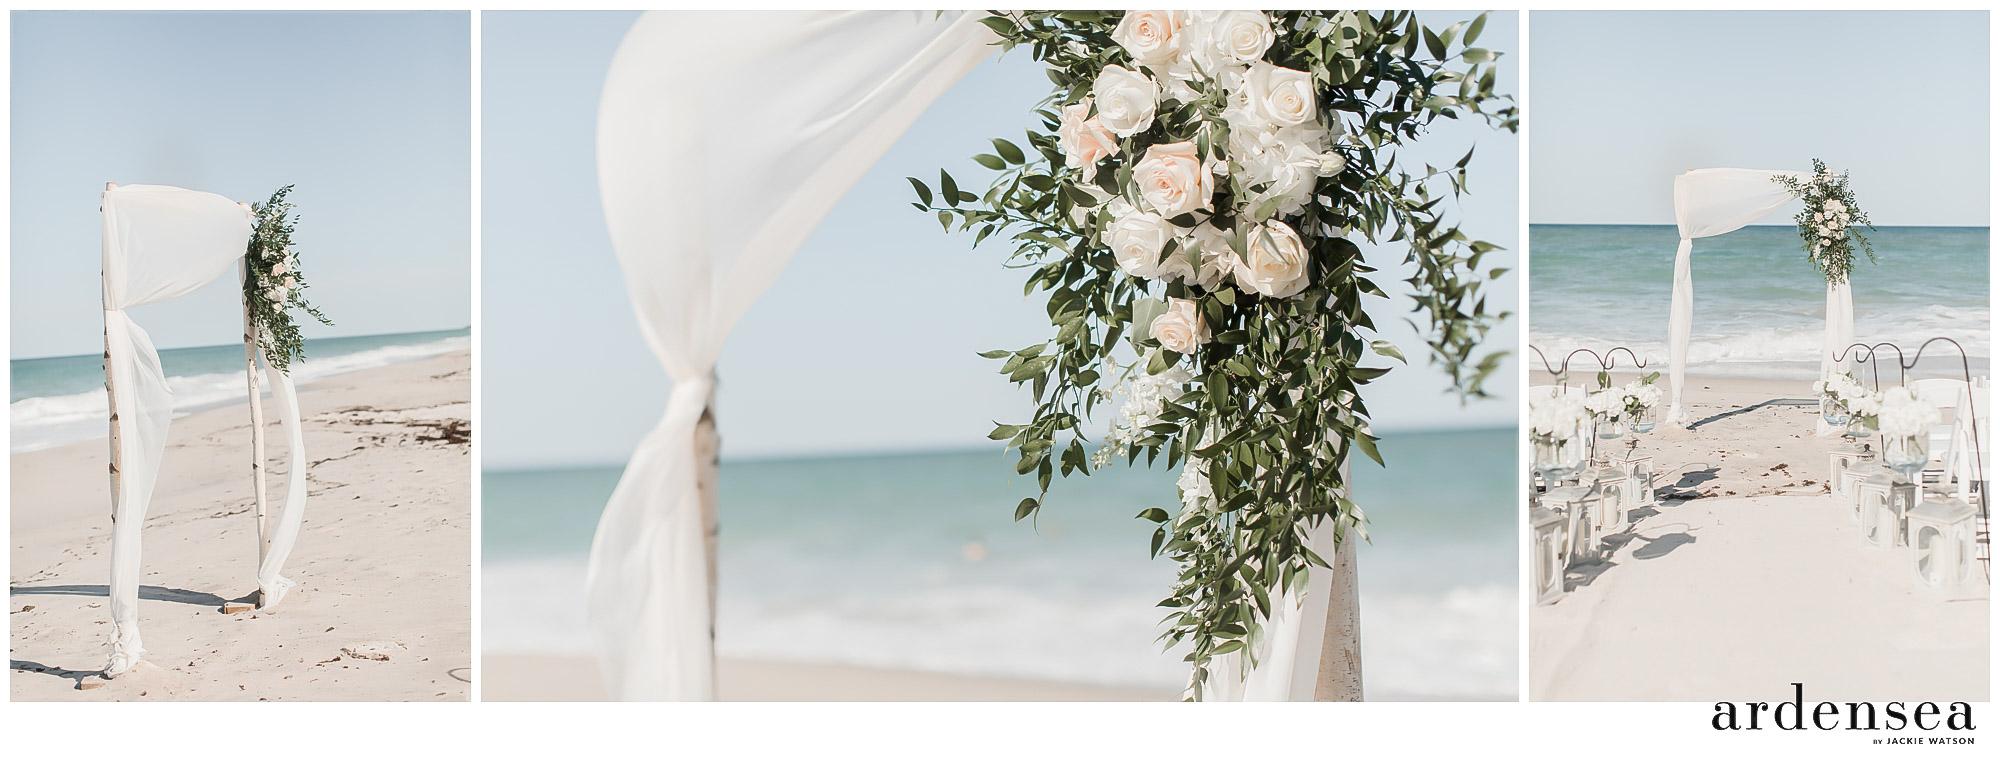 beach wedding venue alter